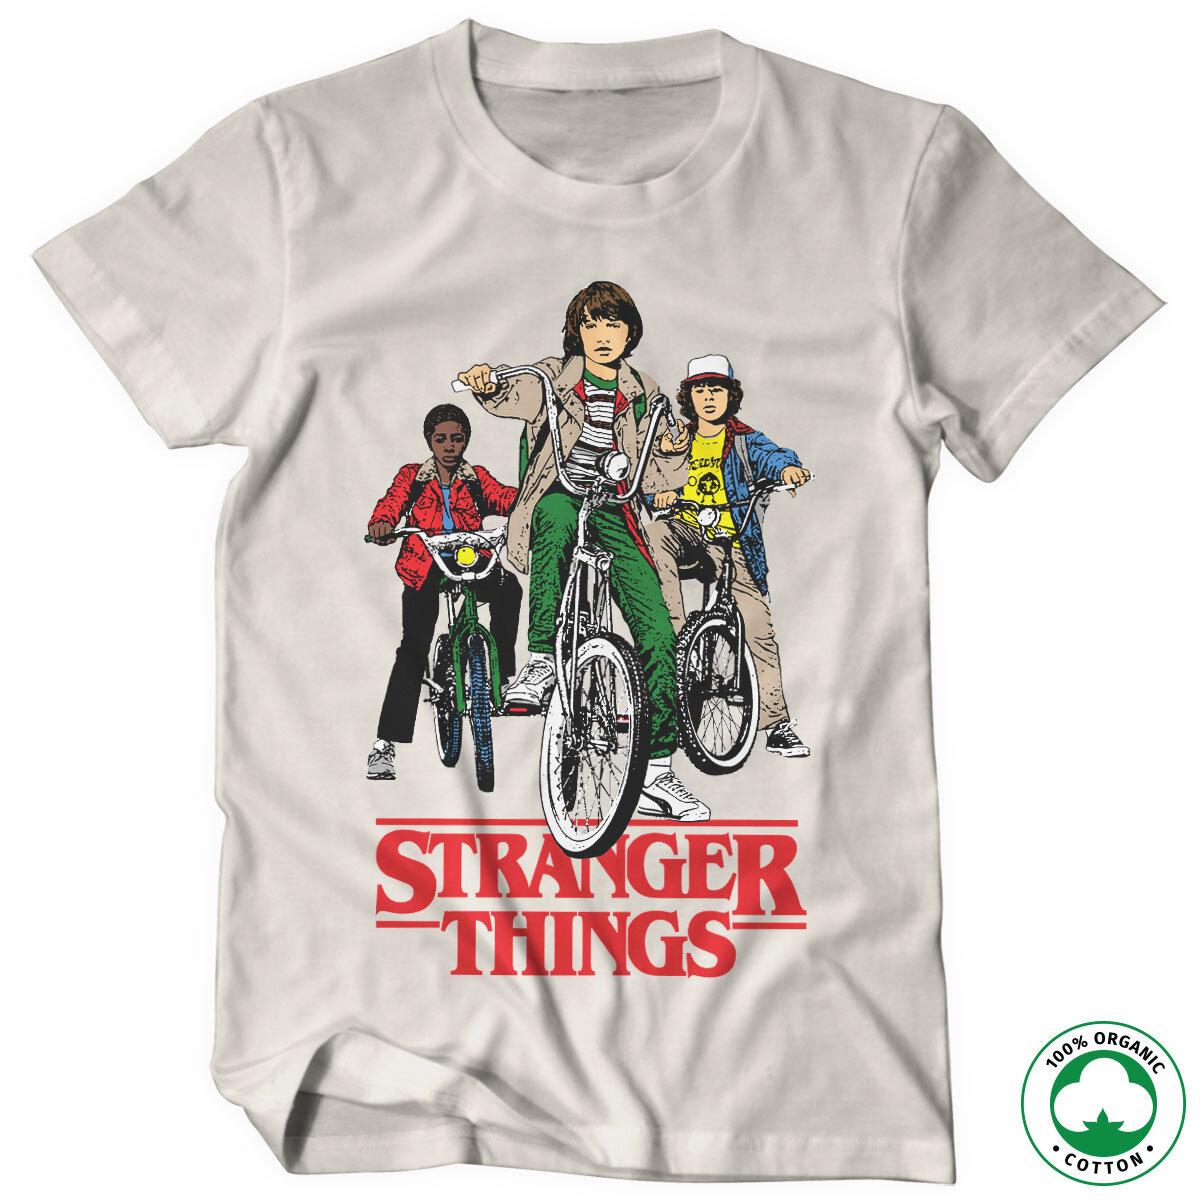 Stranger Things Bikes Organic T-Shirt